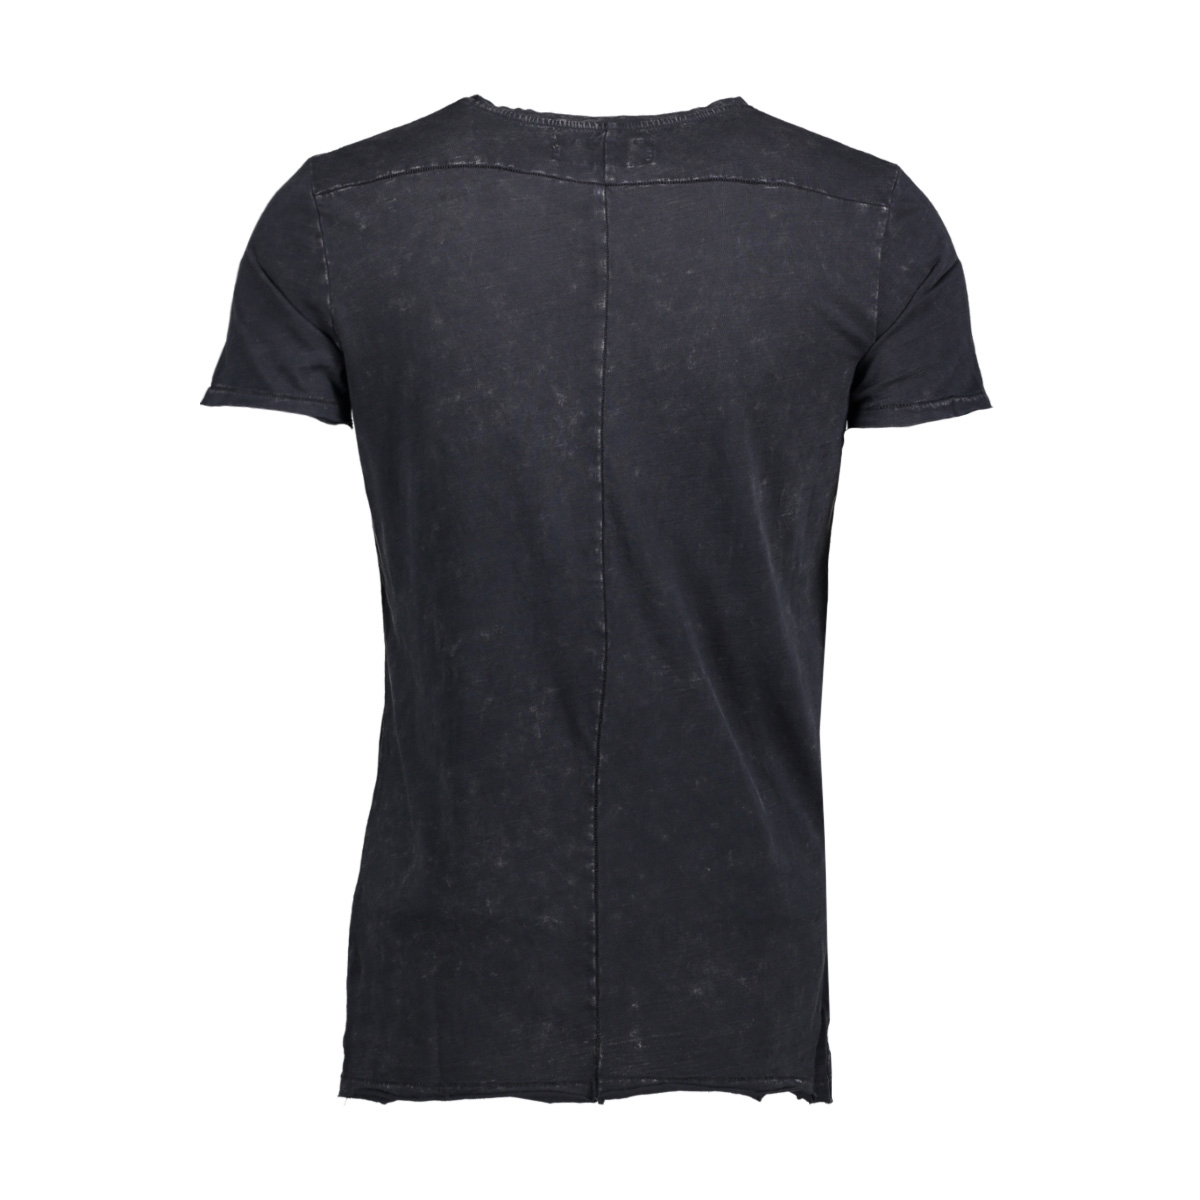 l71206 garcia t-shirt 2350